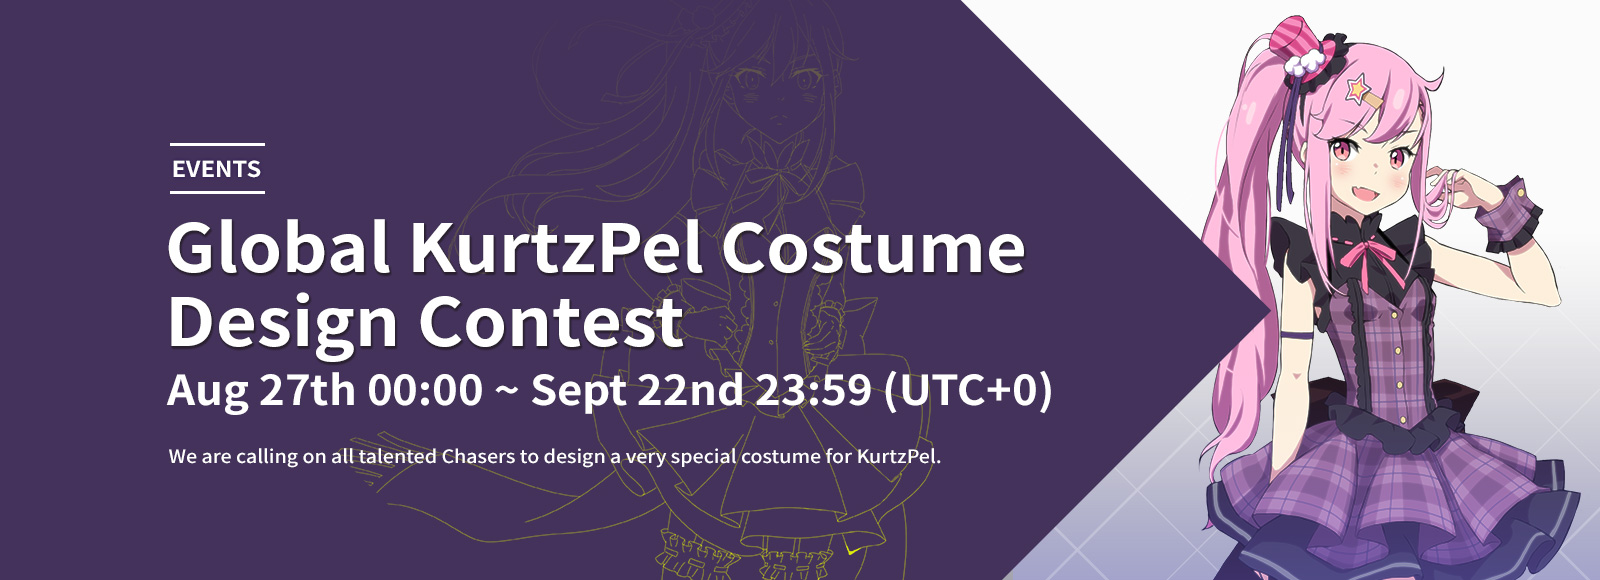 Global KurtzPel Costume Design Contest